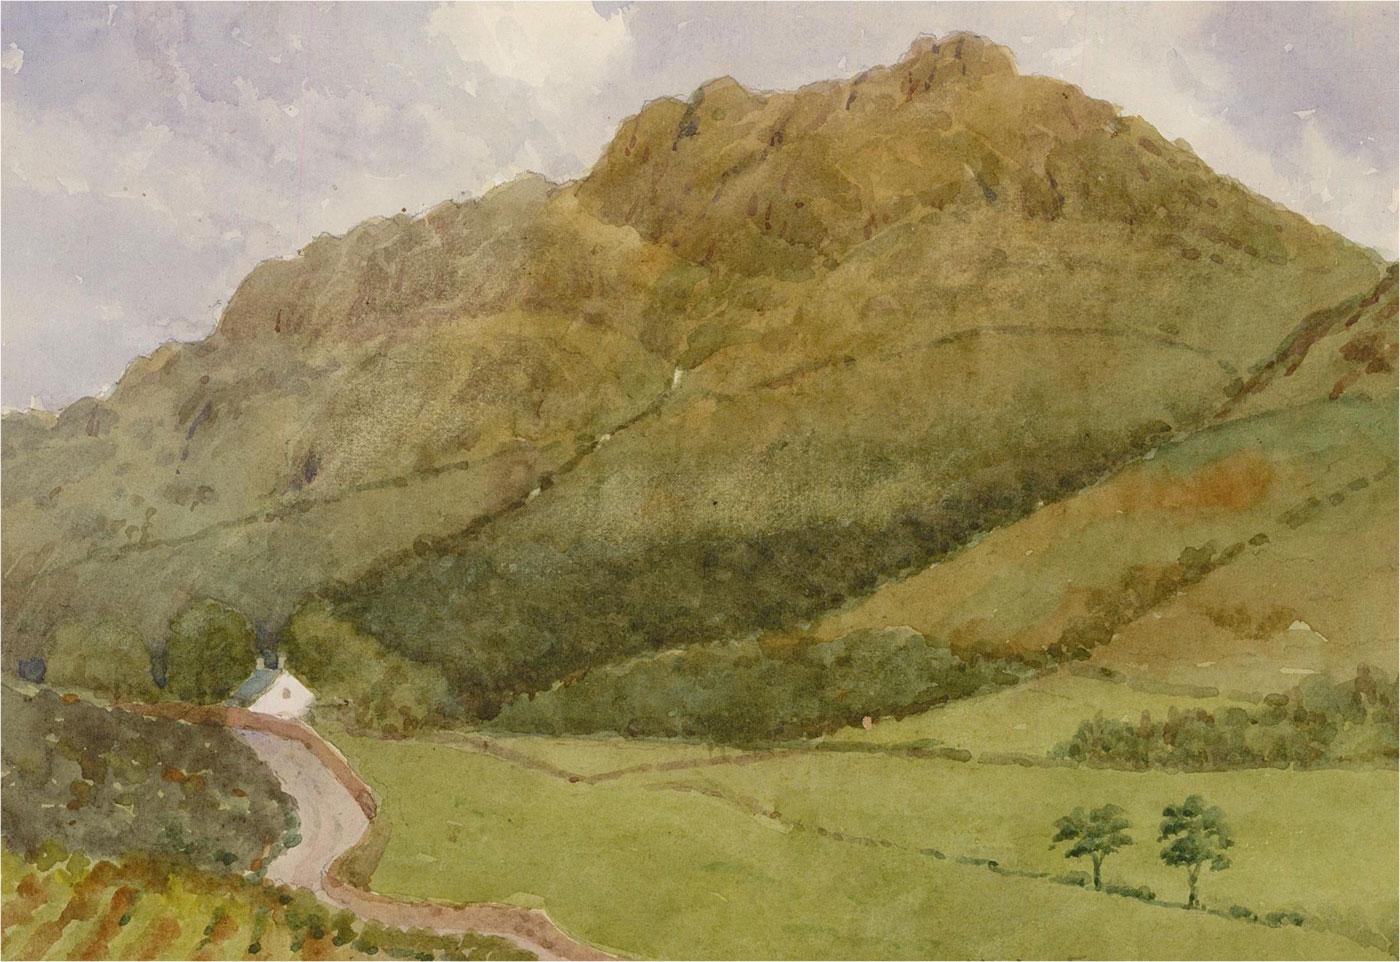 Raymond Turner Barker (1872-1945) - Early 20th Century Watercolour, Harter Fell